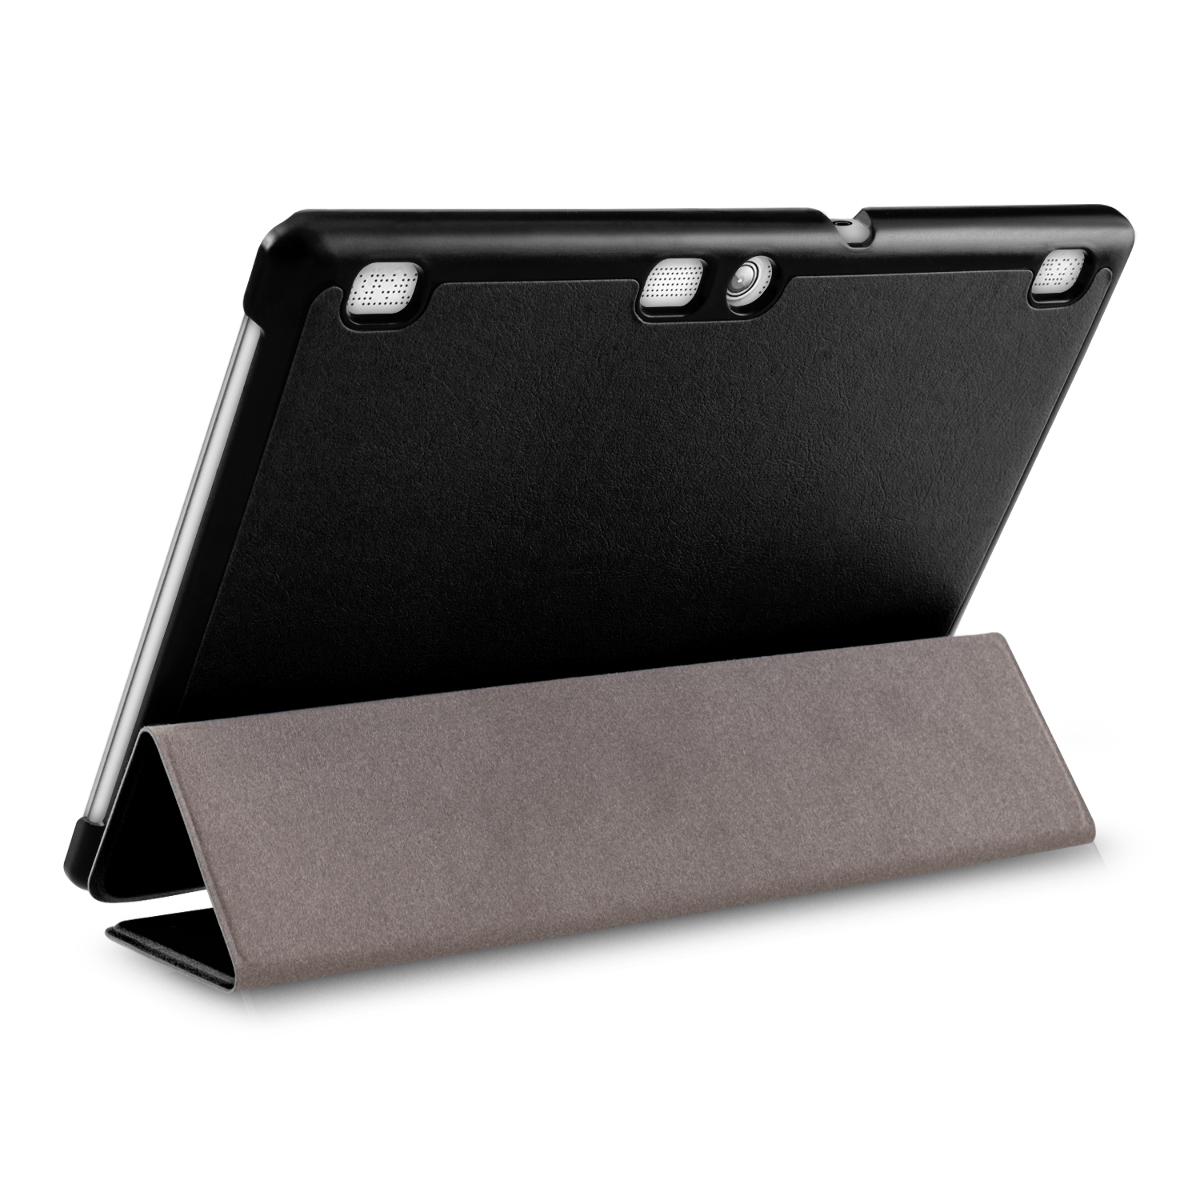 Funda para lenovo tab 2 a10 negro carcasa protectora - Funda protectora tablet ...